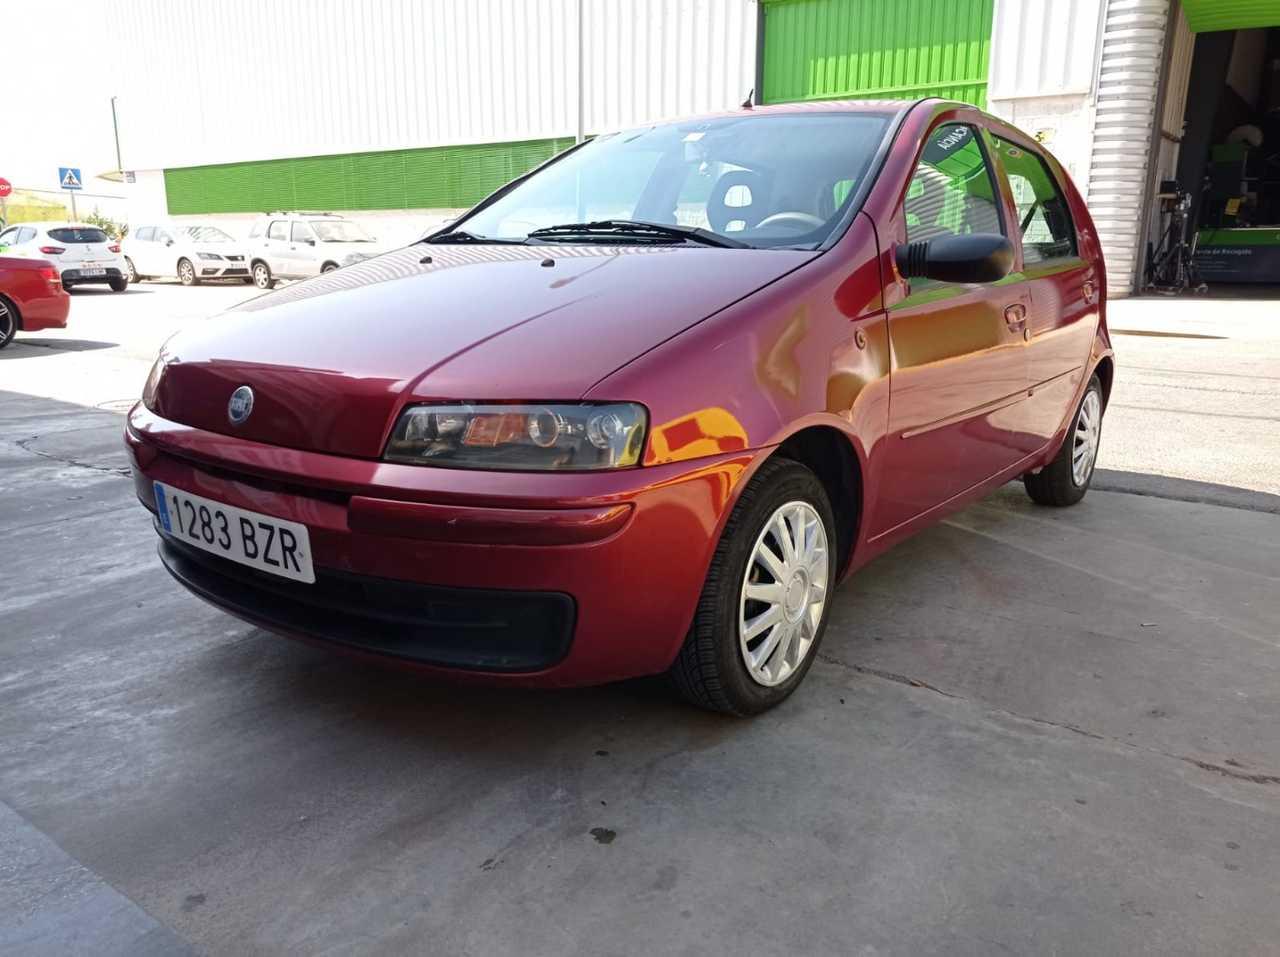 Fiat Punto  ocasión segunda mano 2002 Gasolina por 1.800€ en Málaga